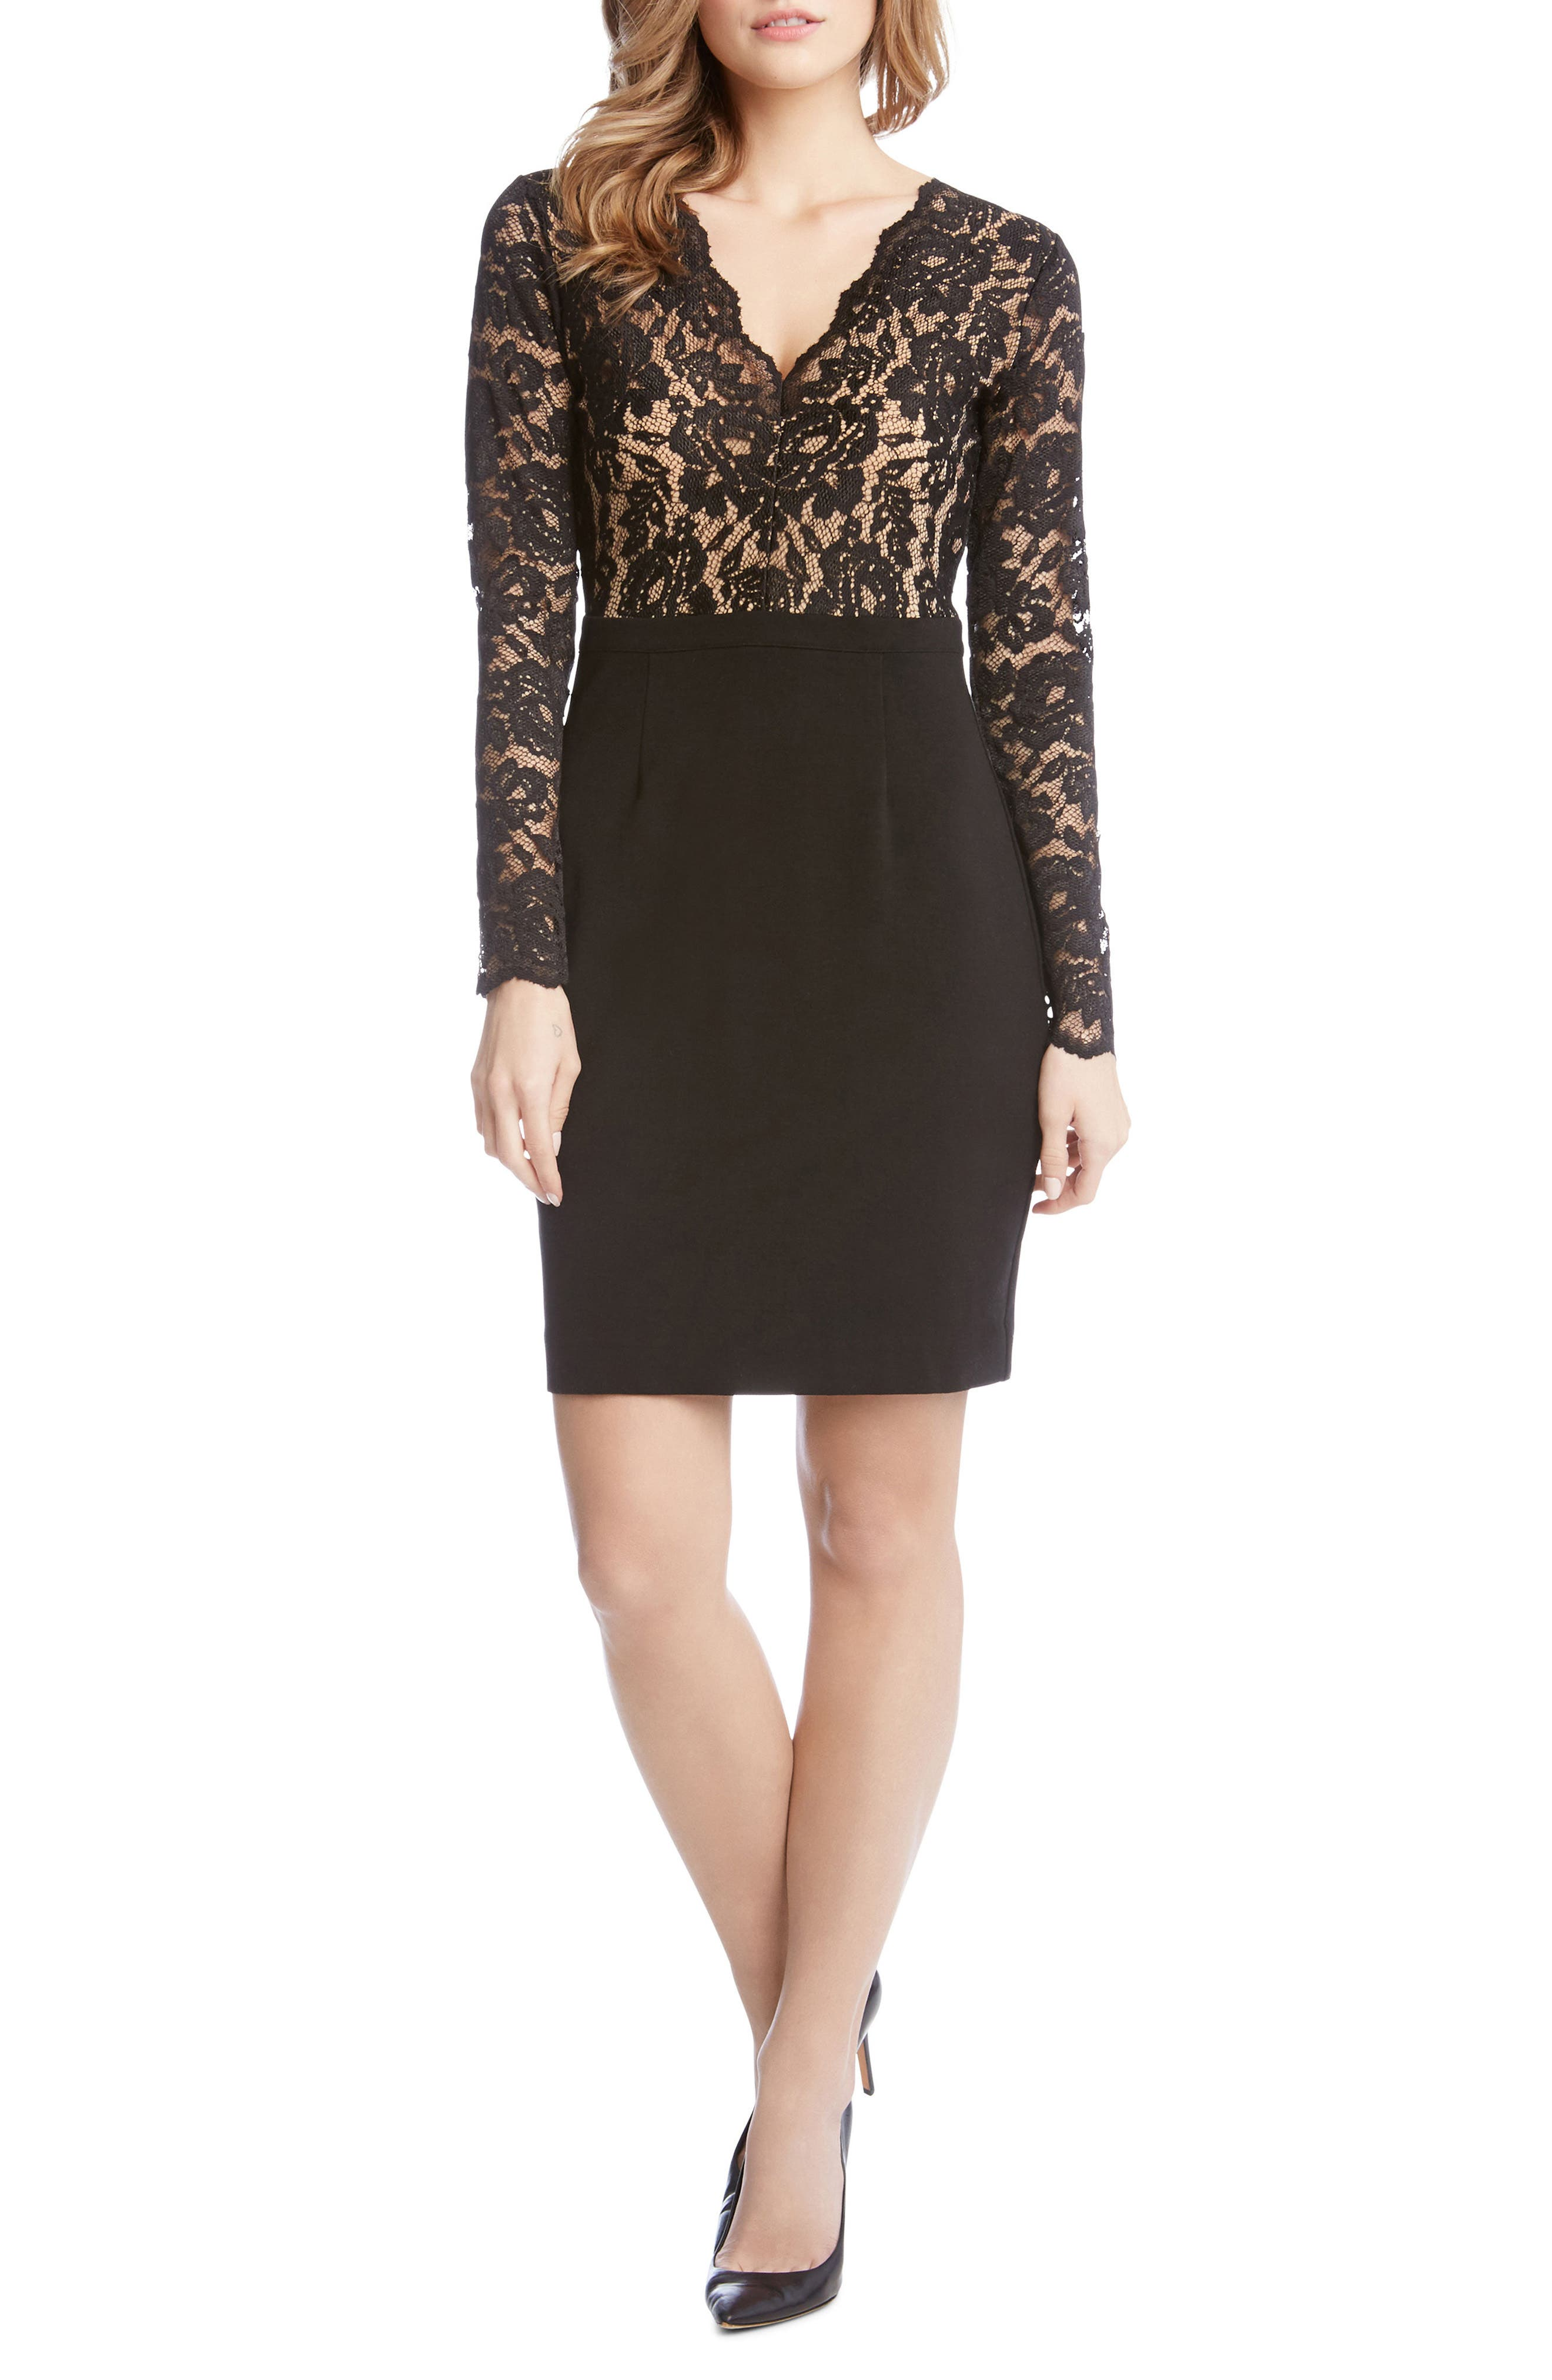 Alternate Image 1 Selected - Karen Kane Becca Lace & Knit Sheath Dress